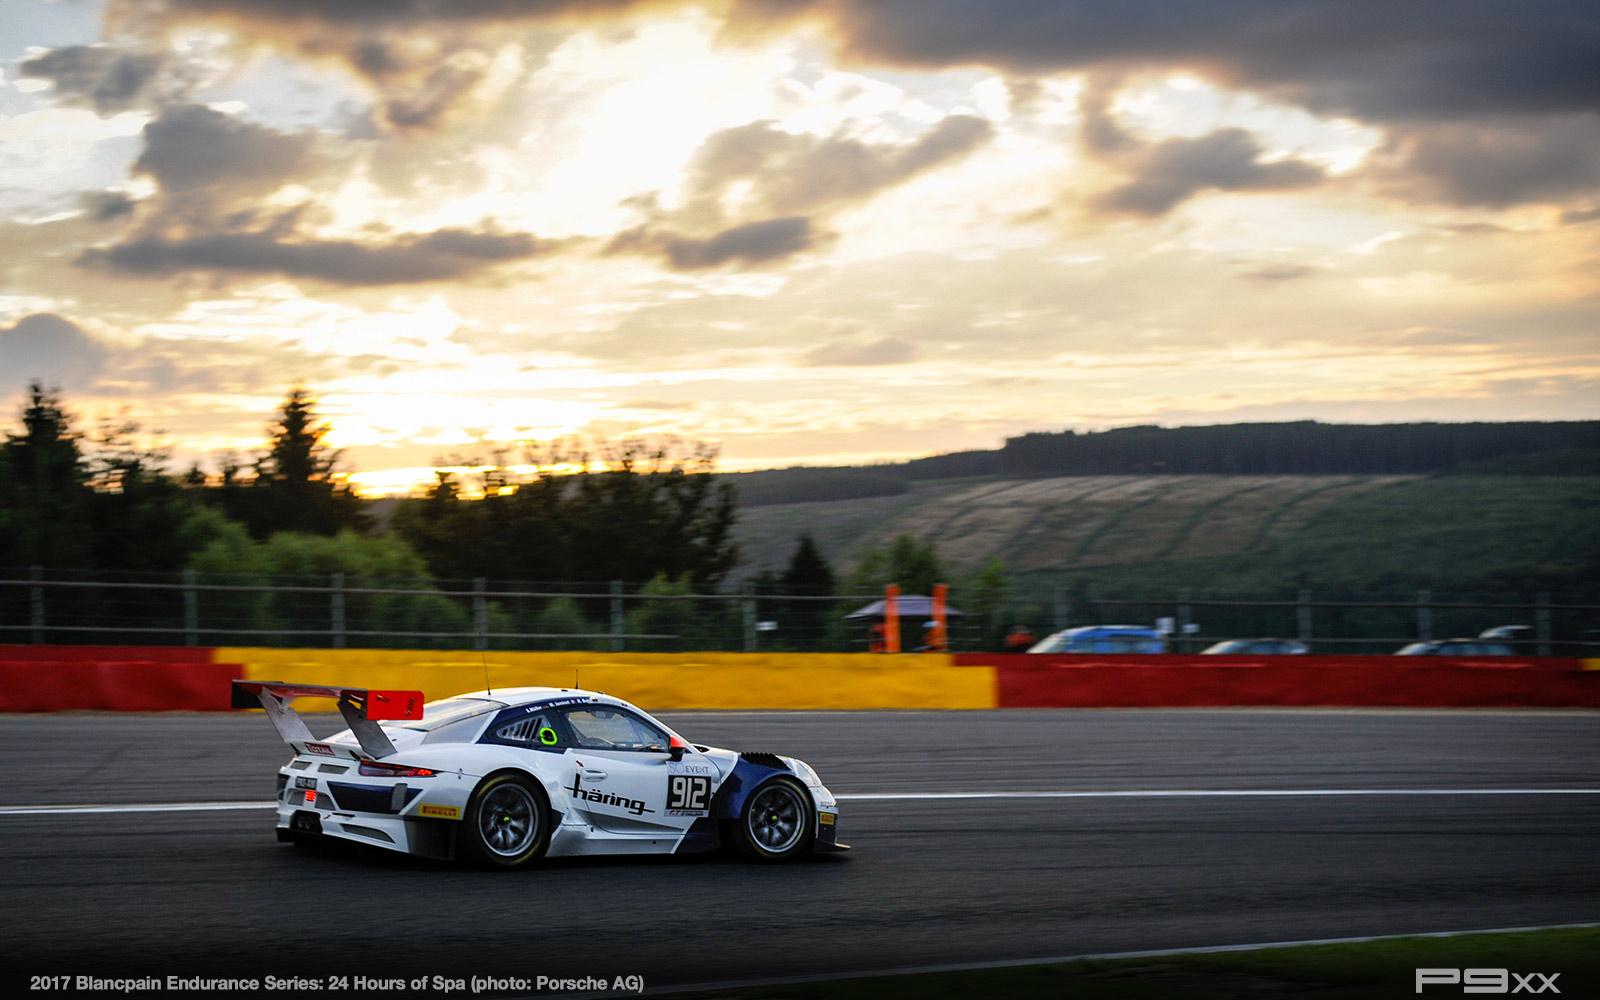 2017-24-Hours-of-Spa-Porsche-322